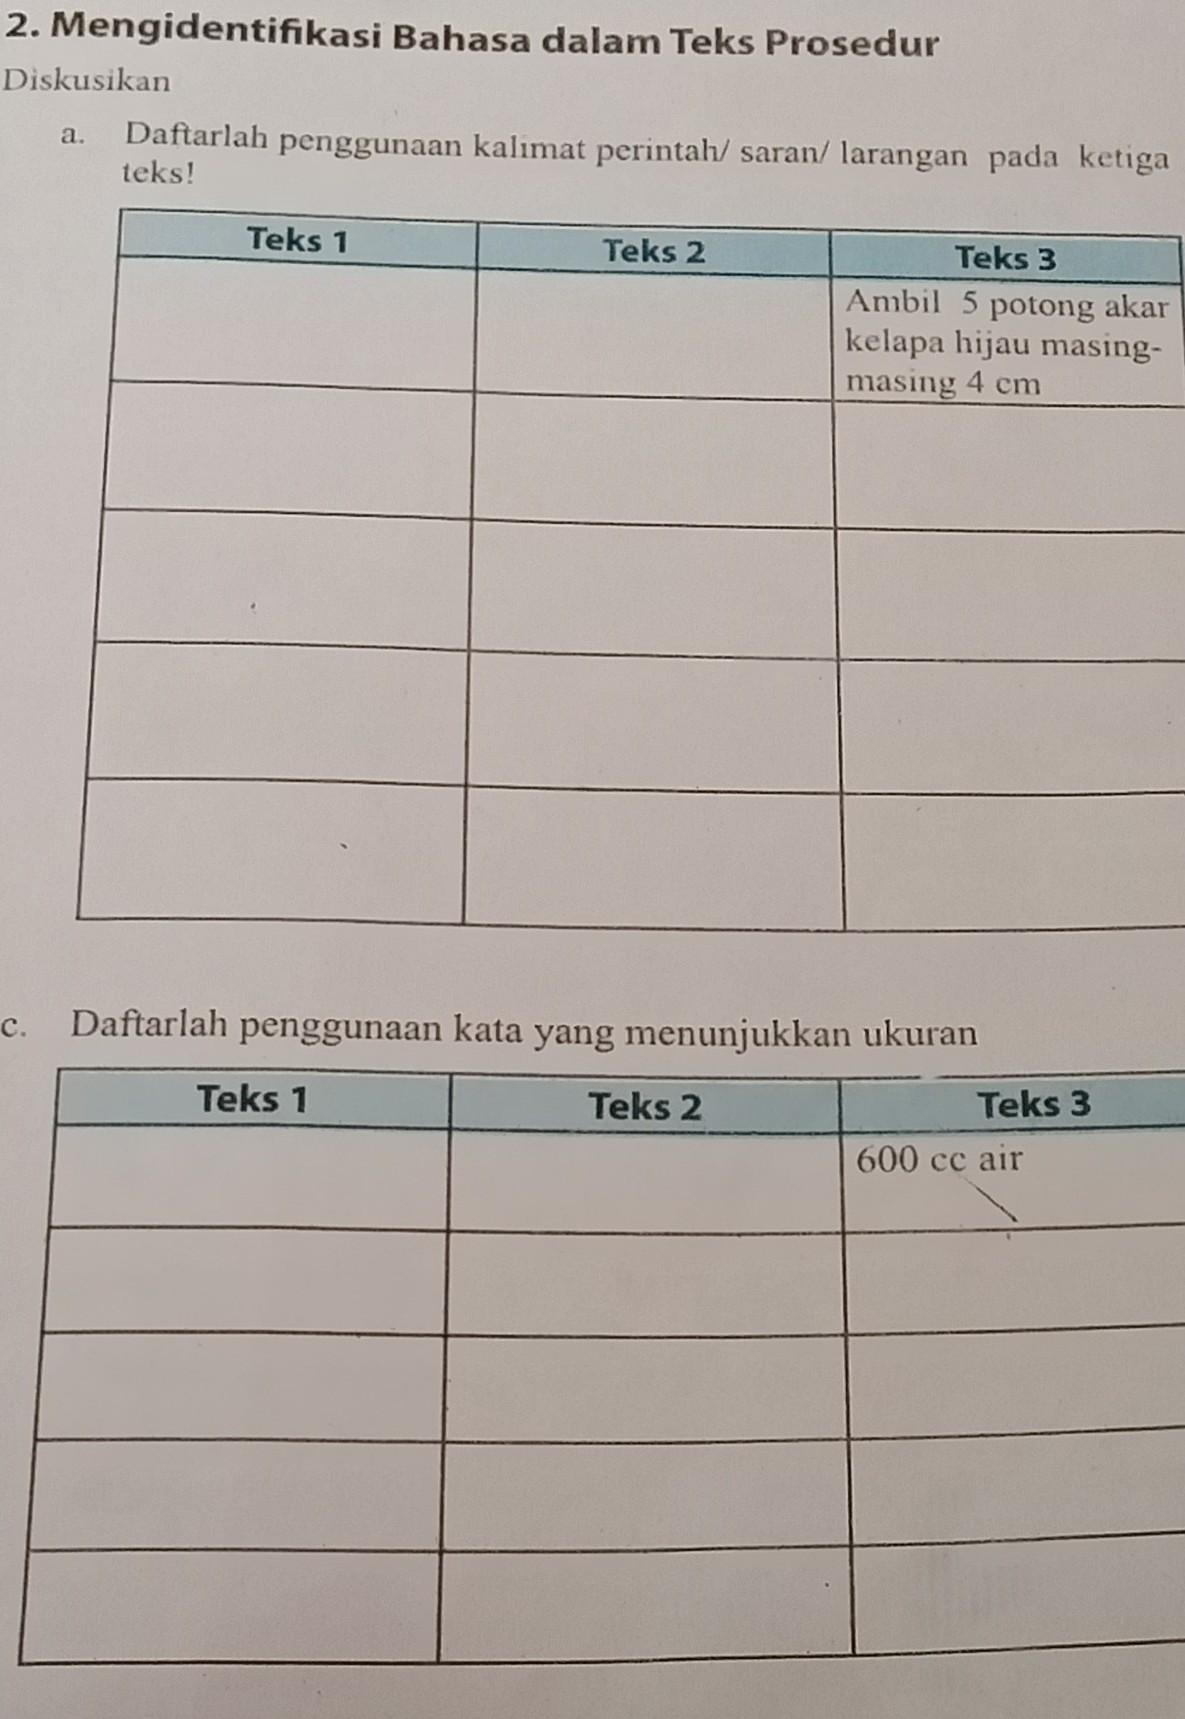 Kunci Jawaban Bahasa Indonesia Kelas 7 Semester 1 Halaman 87